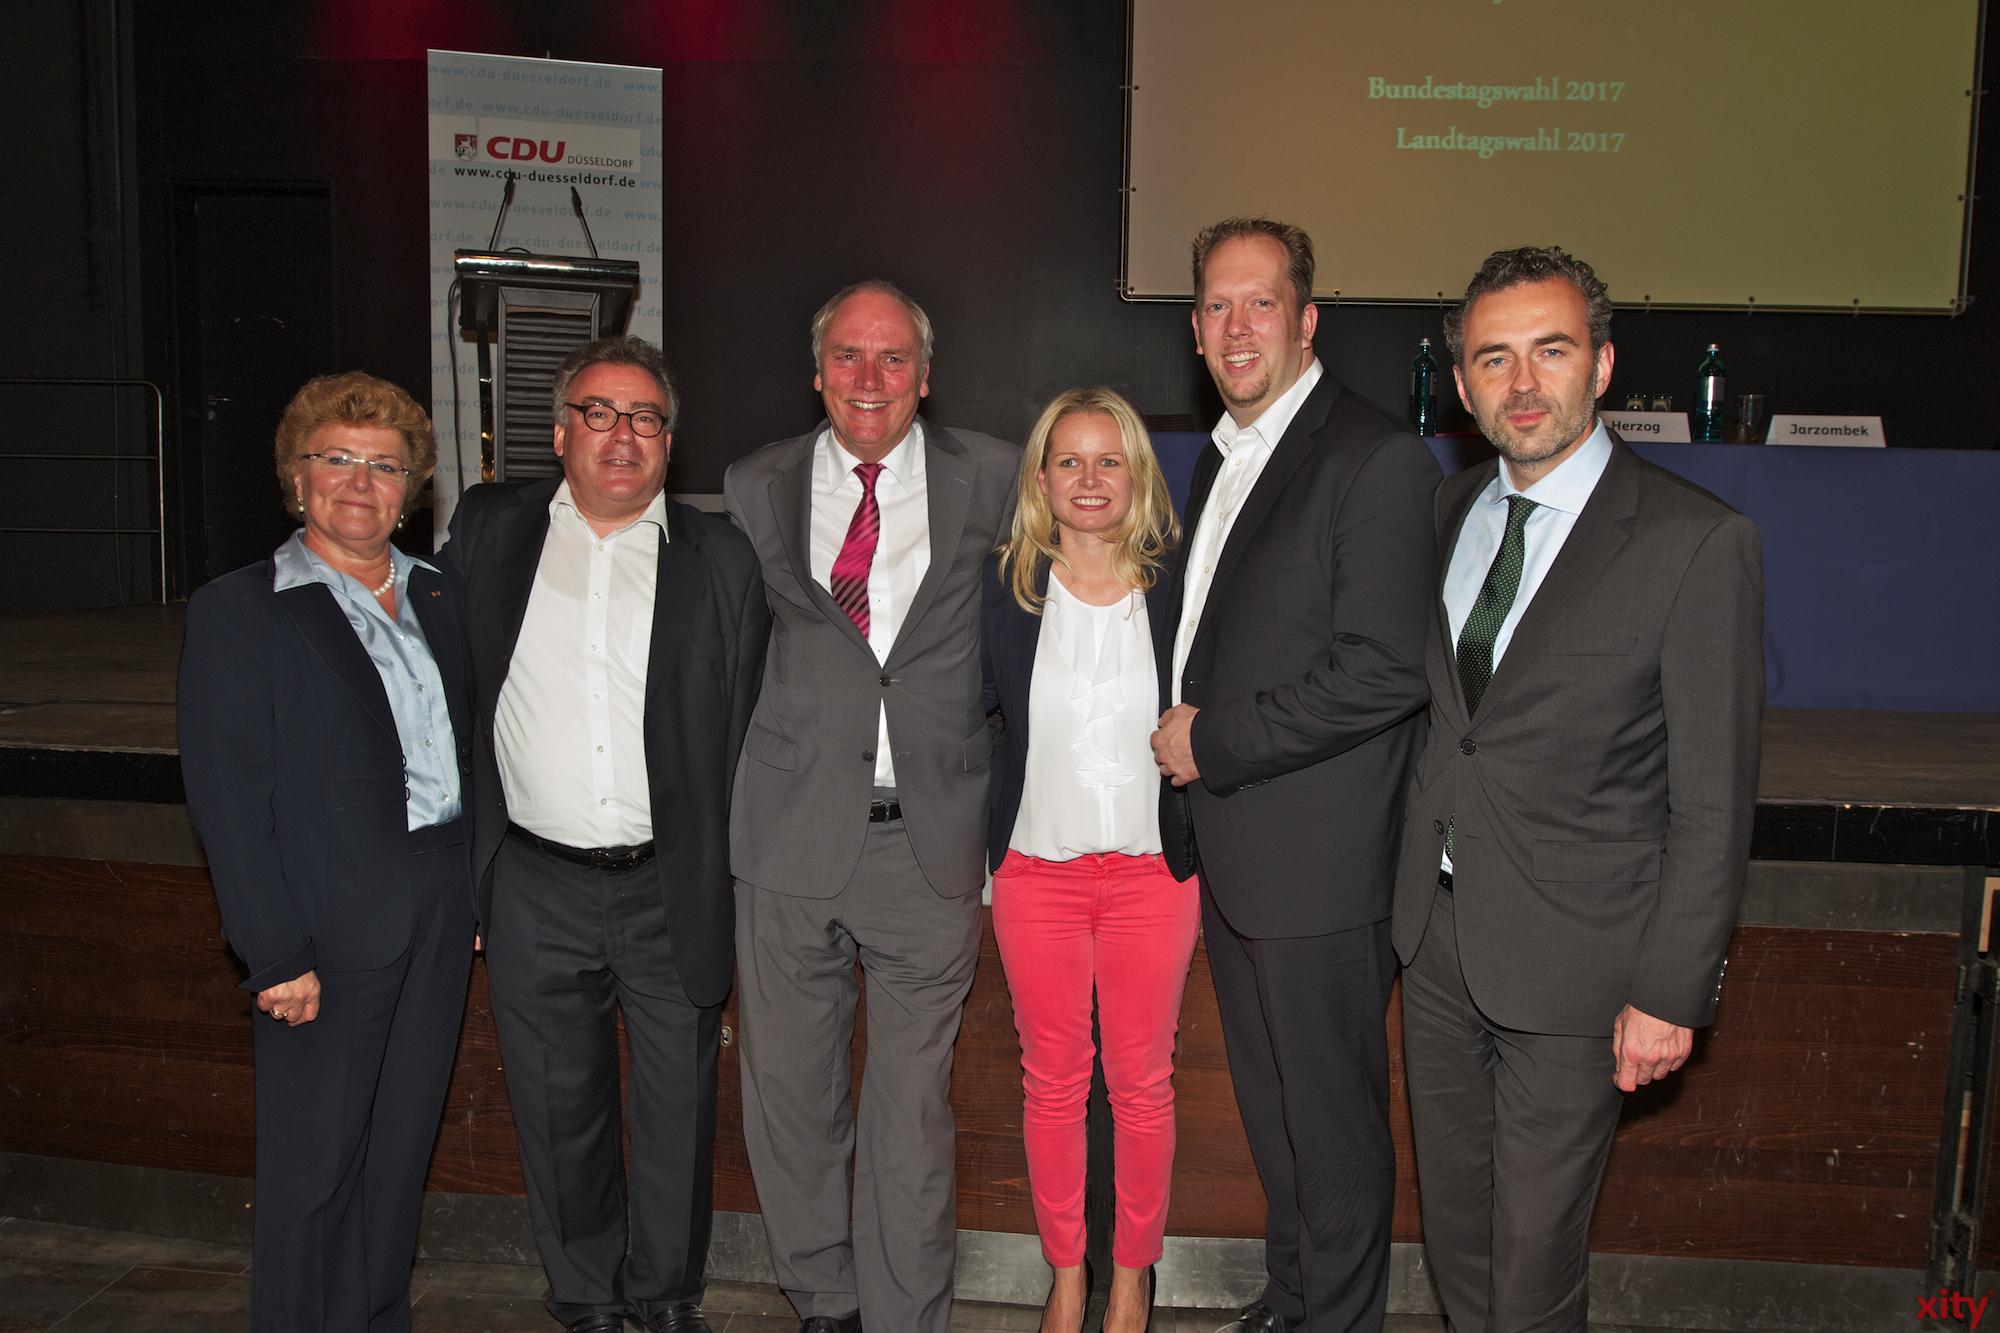 Sylvia Pantel, Olaf Lehne, Peter Preuss, Angela Erwin, Marco Schulz und Thomas Jarzombek (Foto: xity)